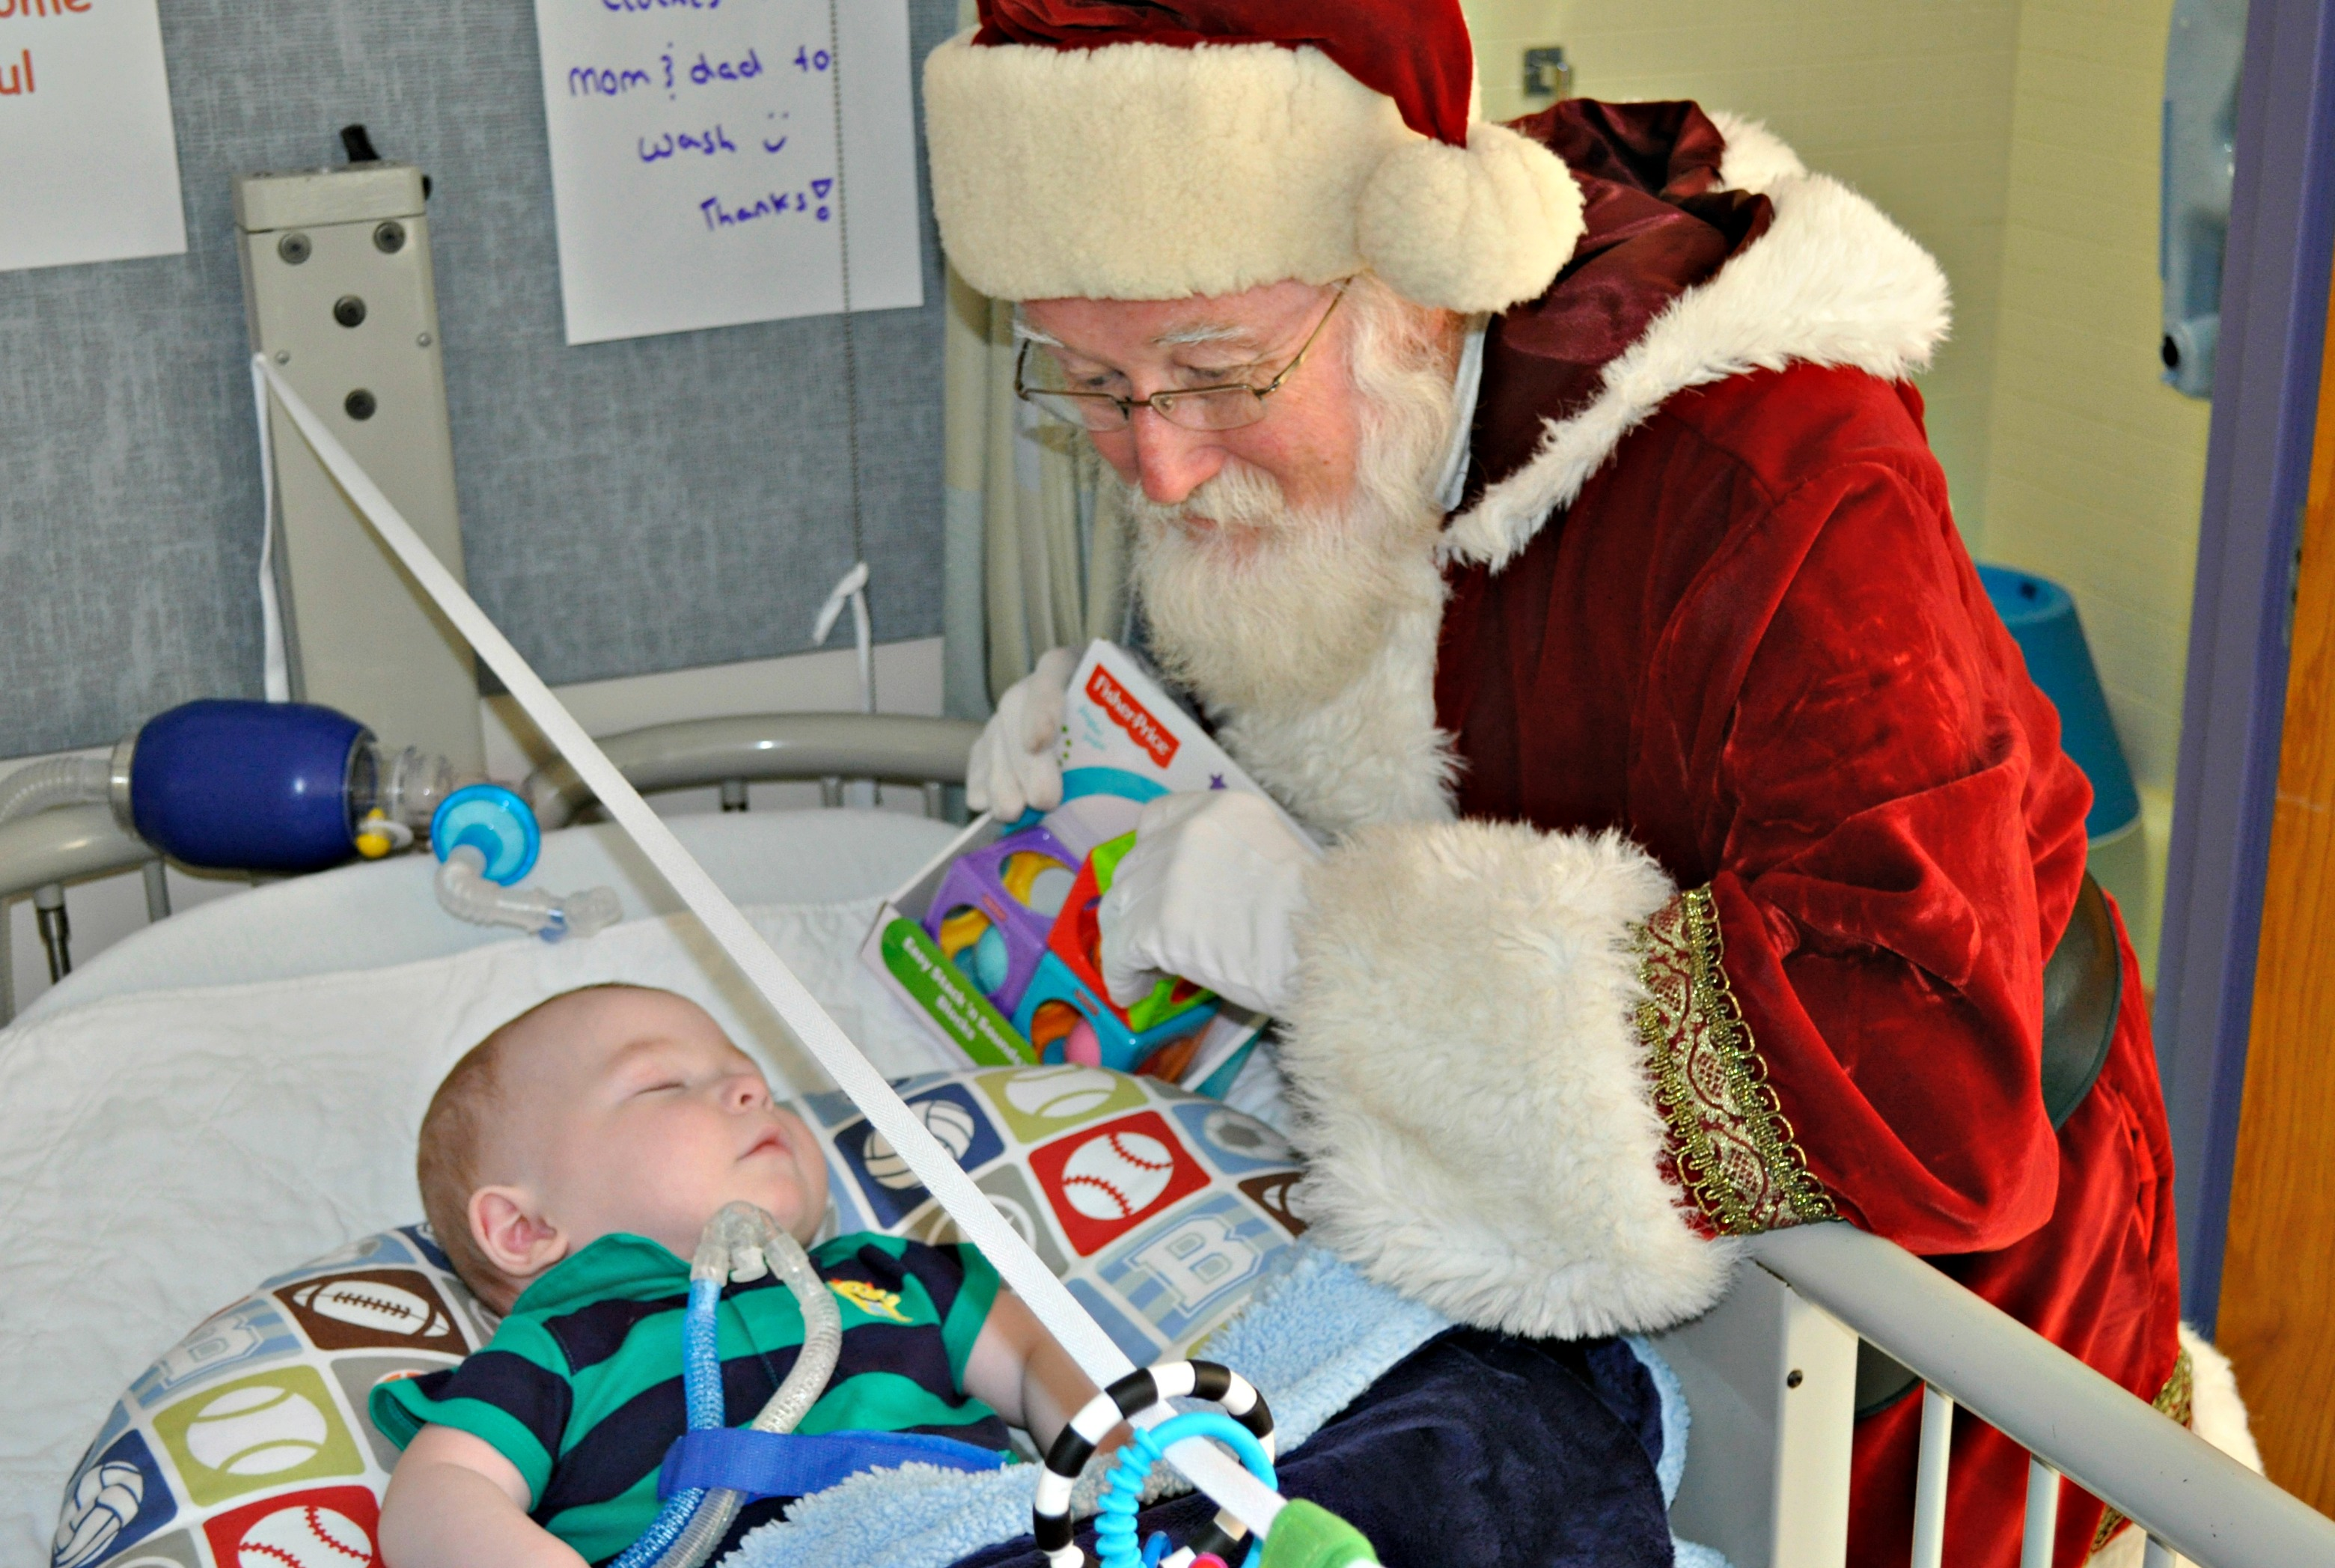 2.Santa Gift